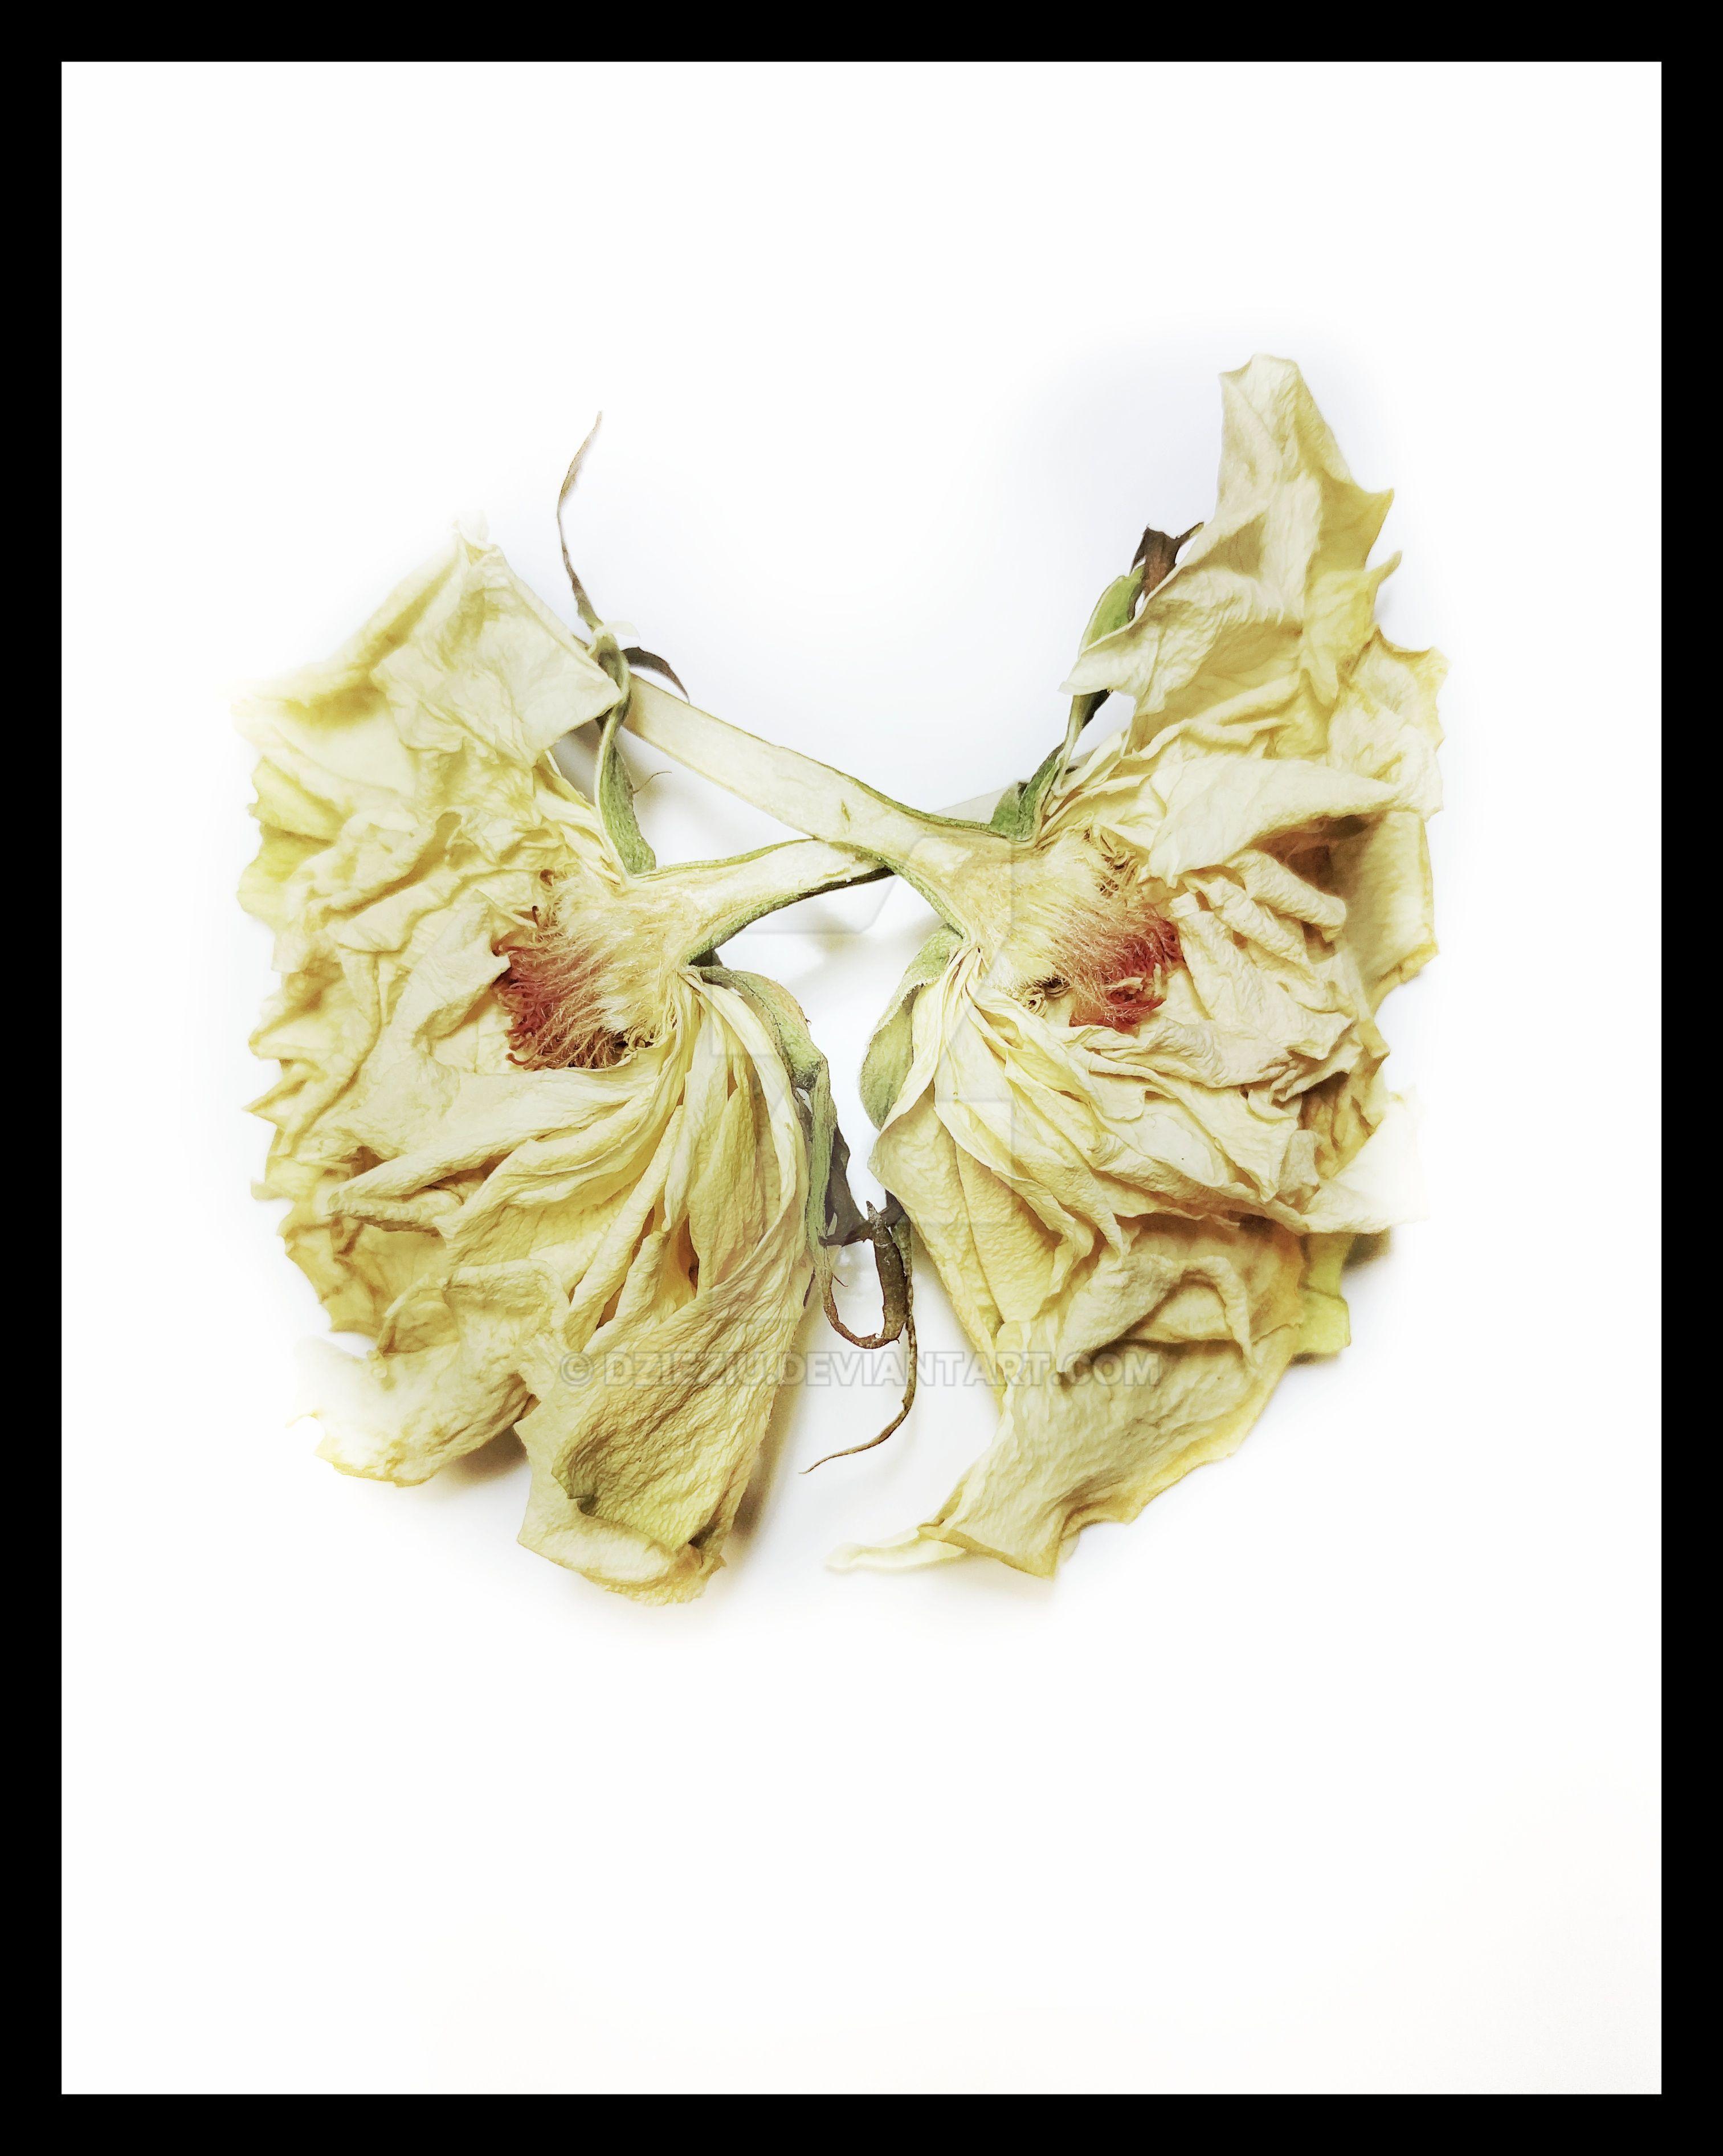 Flower Body Anatomy Album No 5 by Dzieziu on DeviantArt